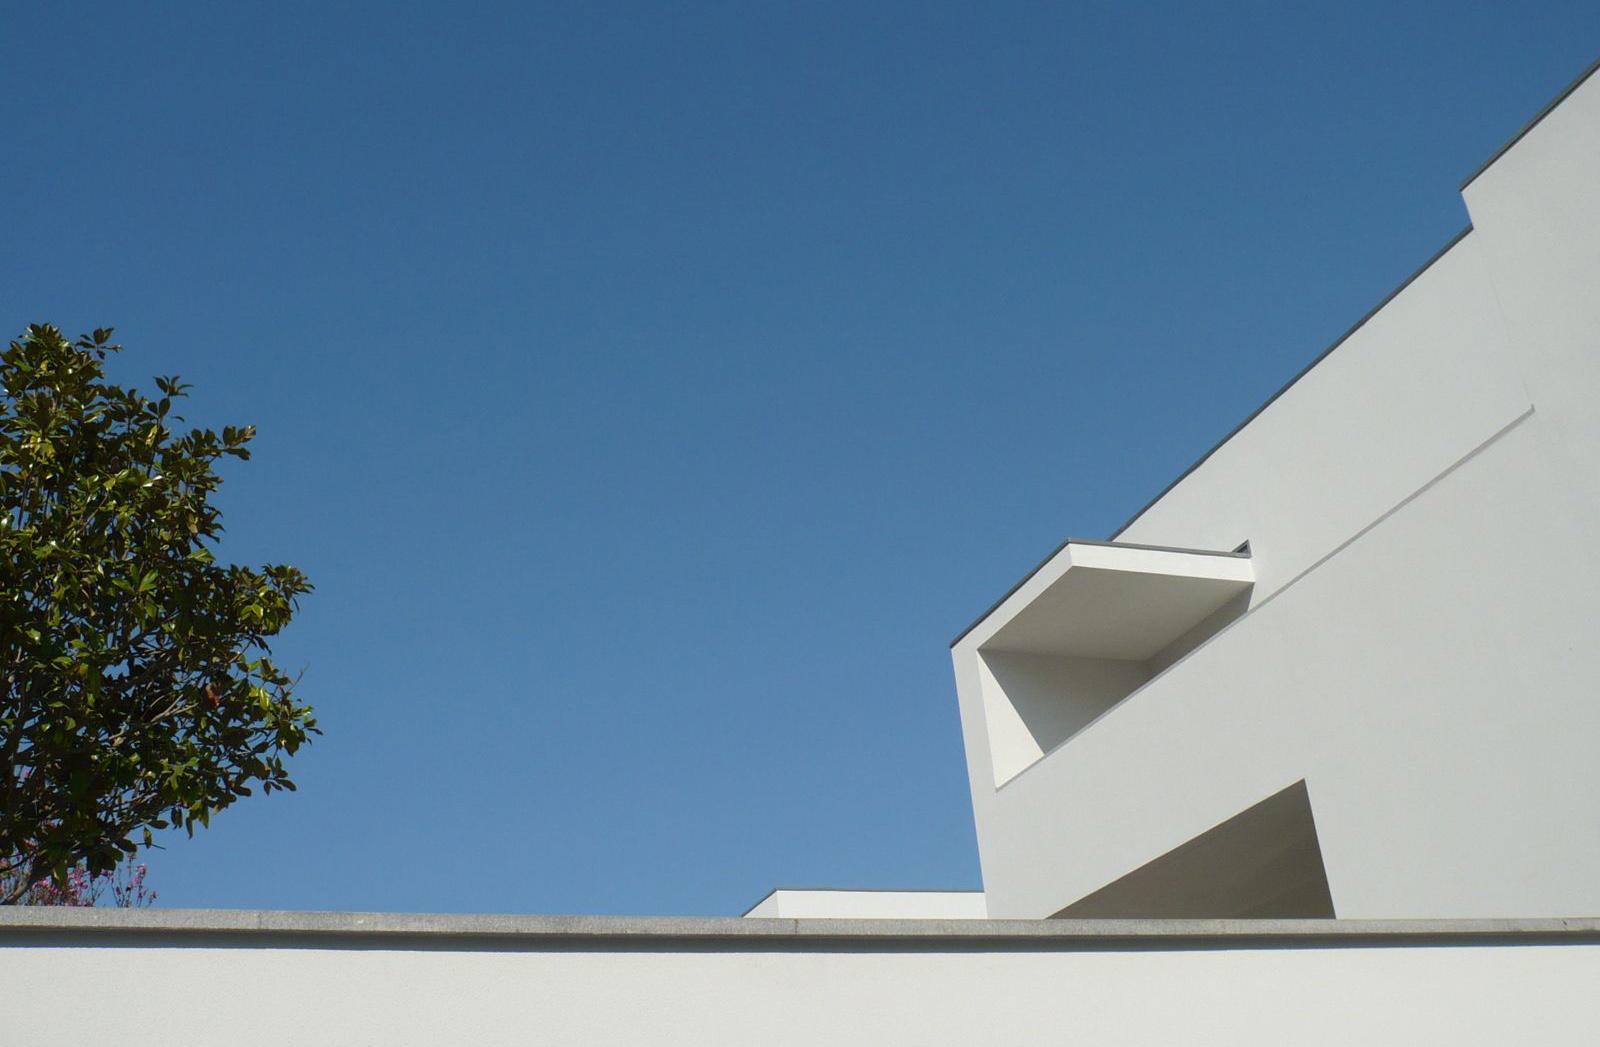 ALVARO Siza Vieira . Av.Boavista residences . Porto (5)